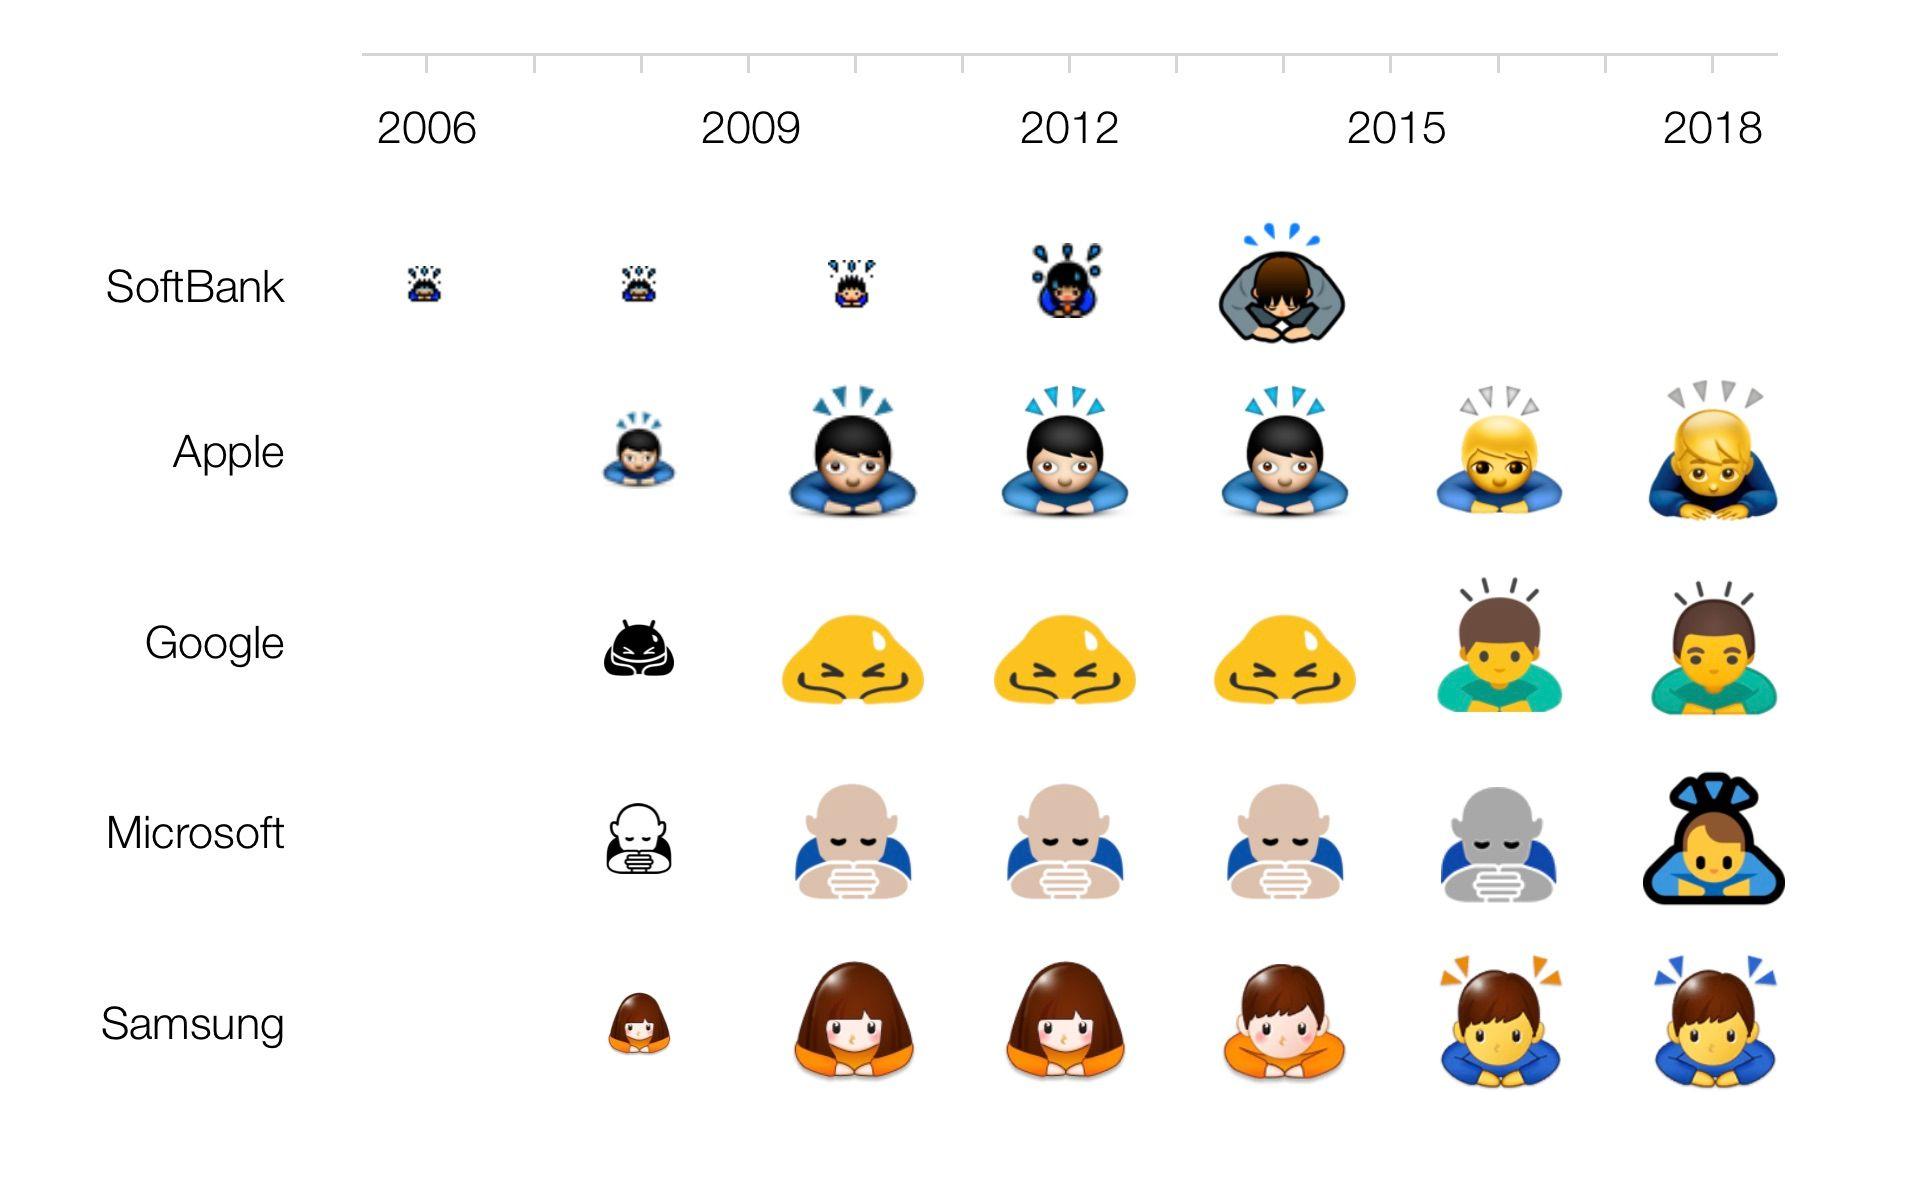 emoji-comparison-2006-2018-softbank-emojipedia